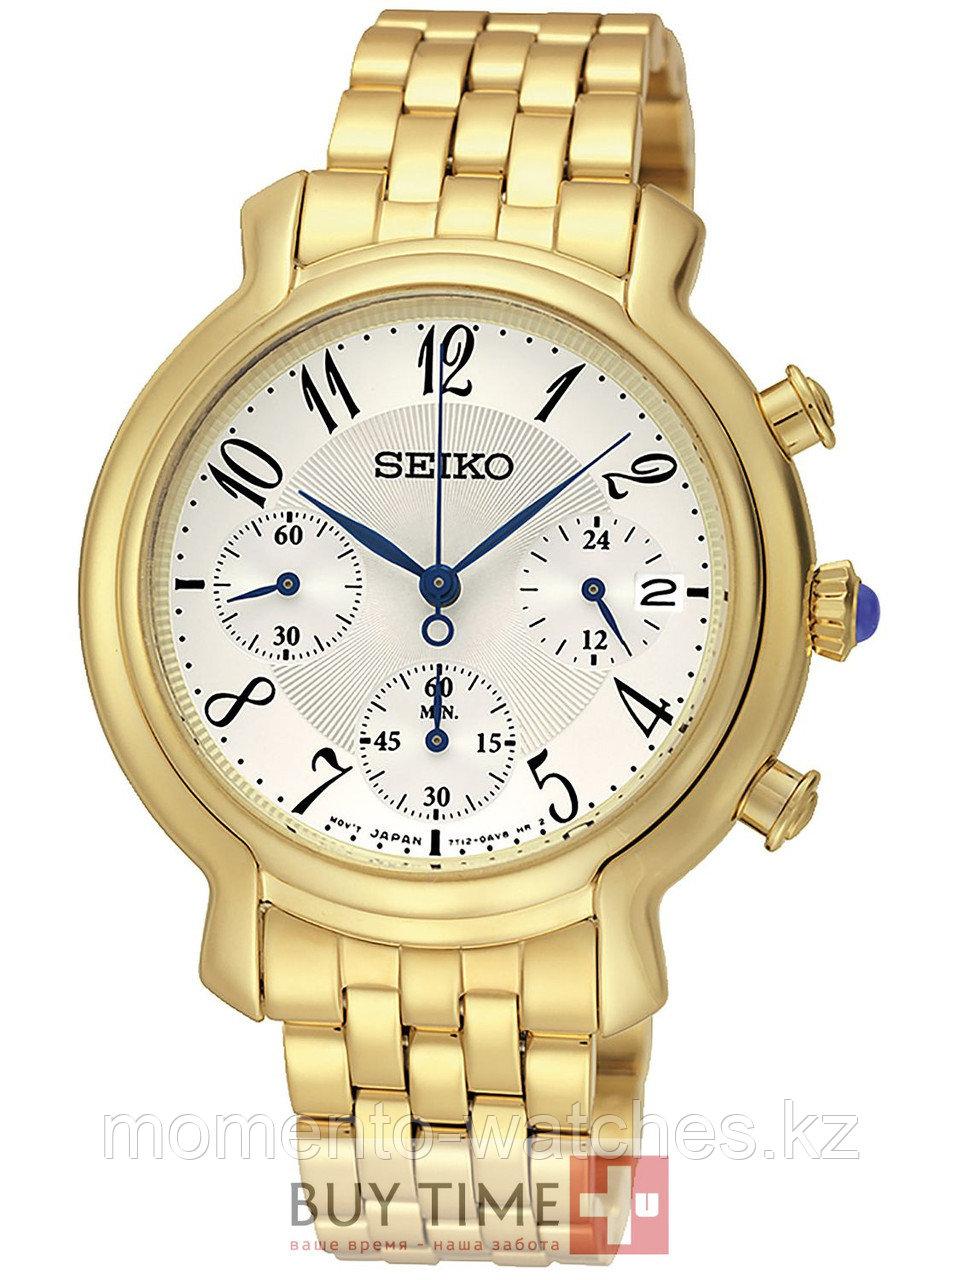 Часы SEIKO SRW874P1